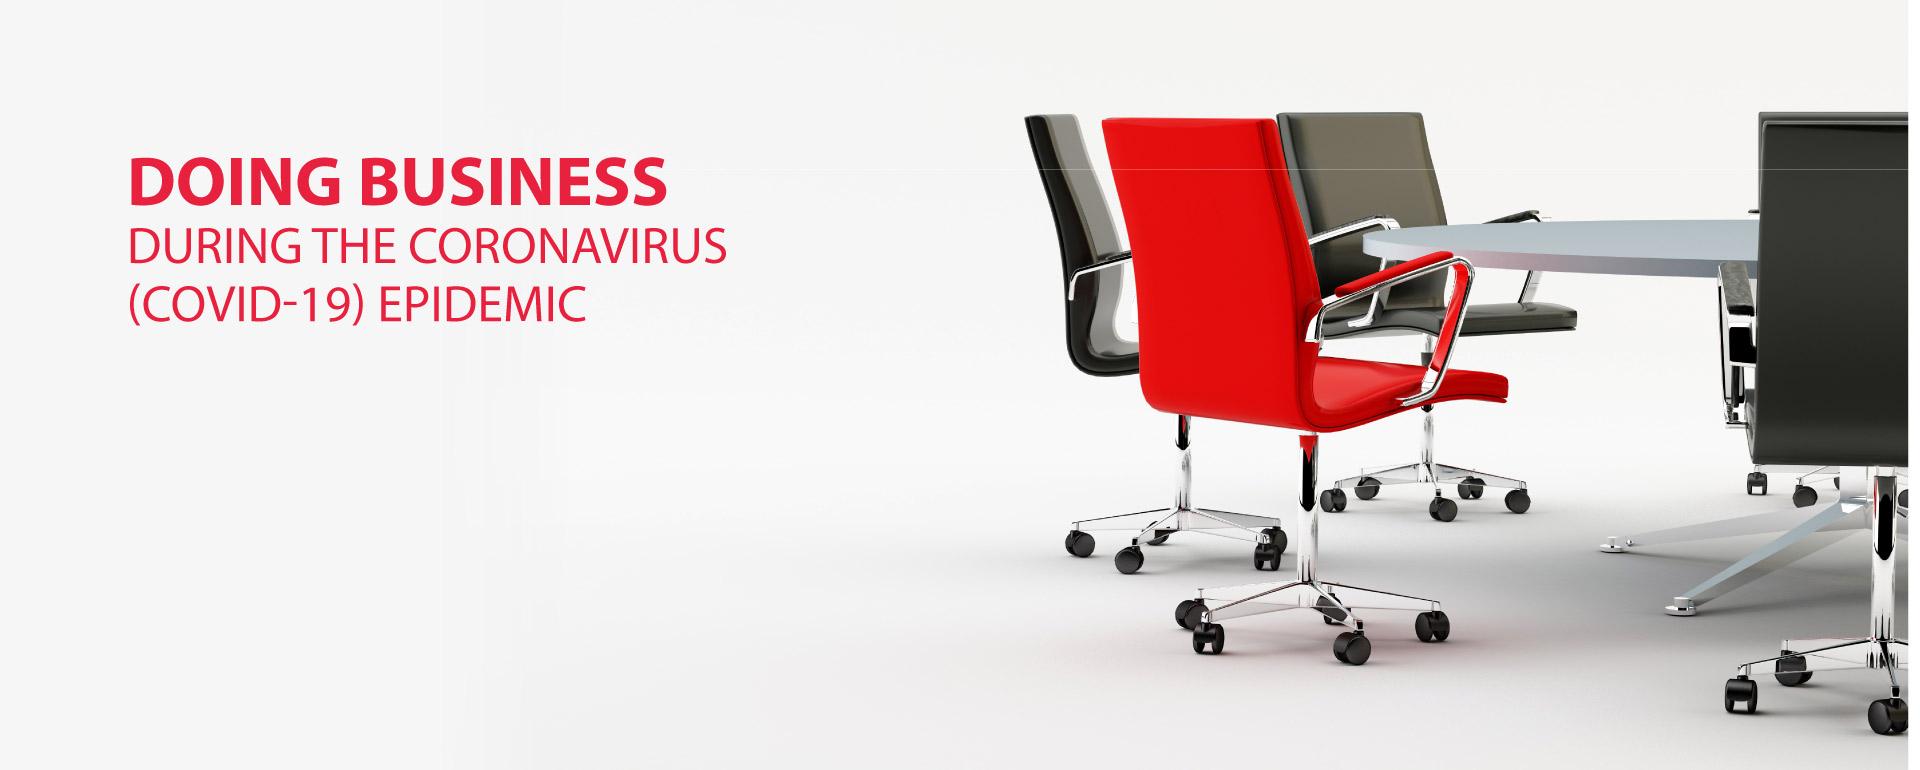 Doing Business During The Coronavirus (COVID-19) epidemic